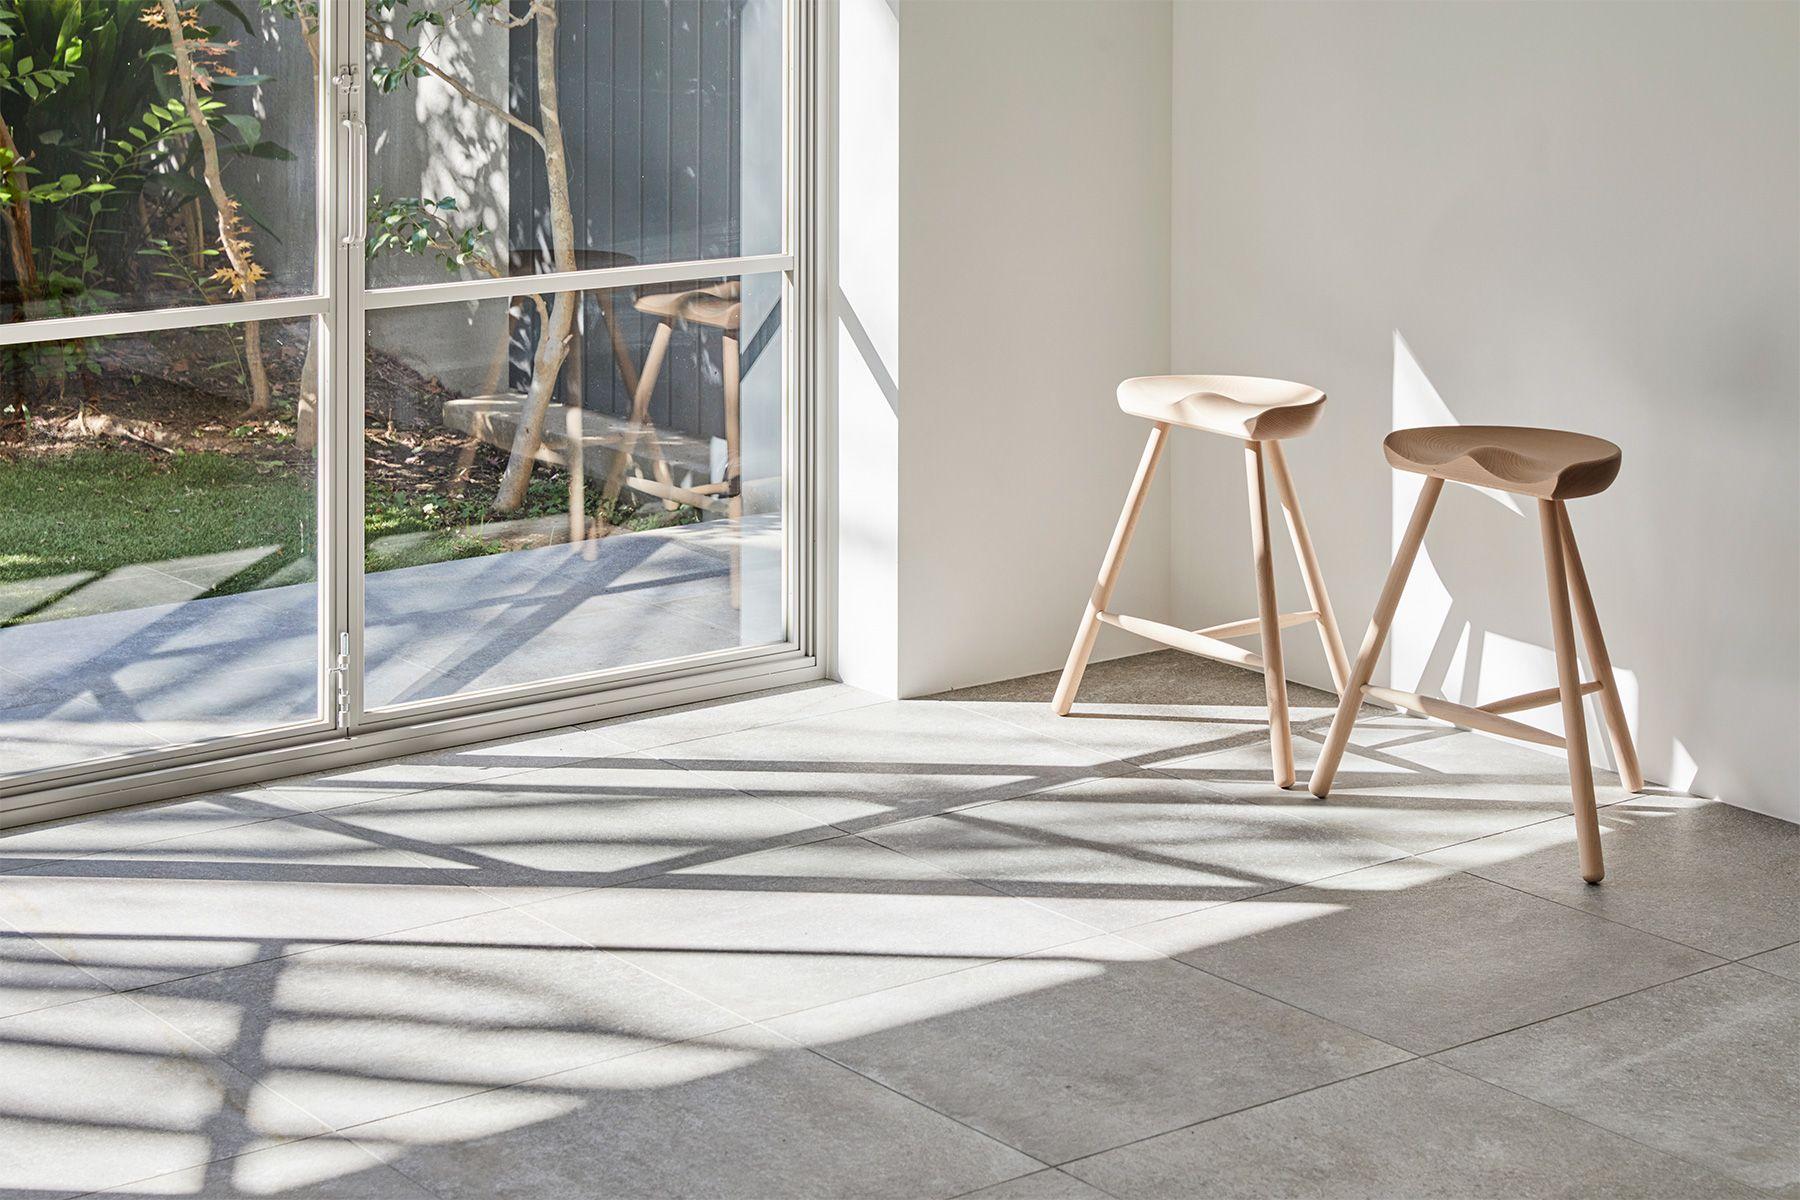 Haku Studio / THE HOUSE (ハクスタジオ)床と白壁